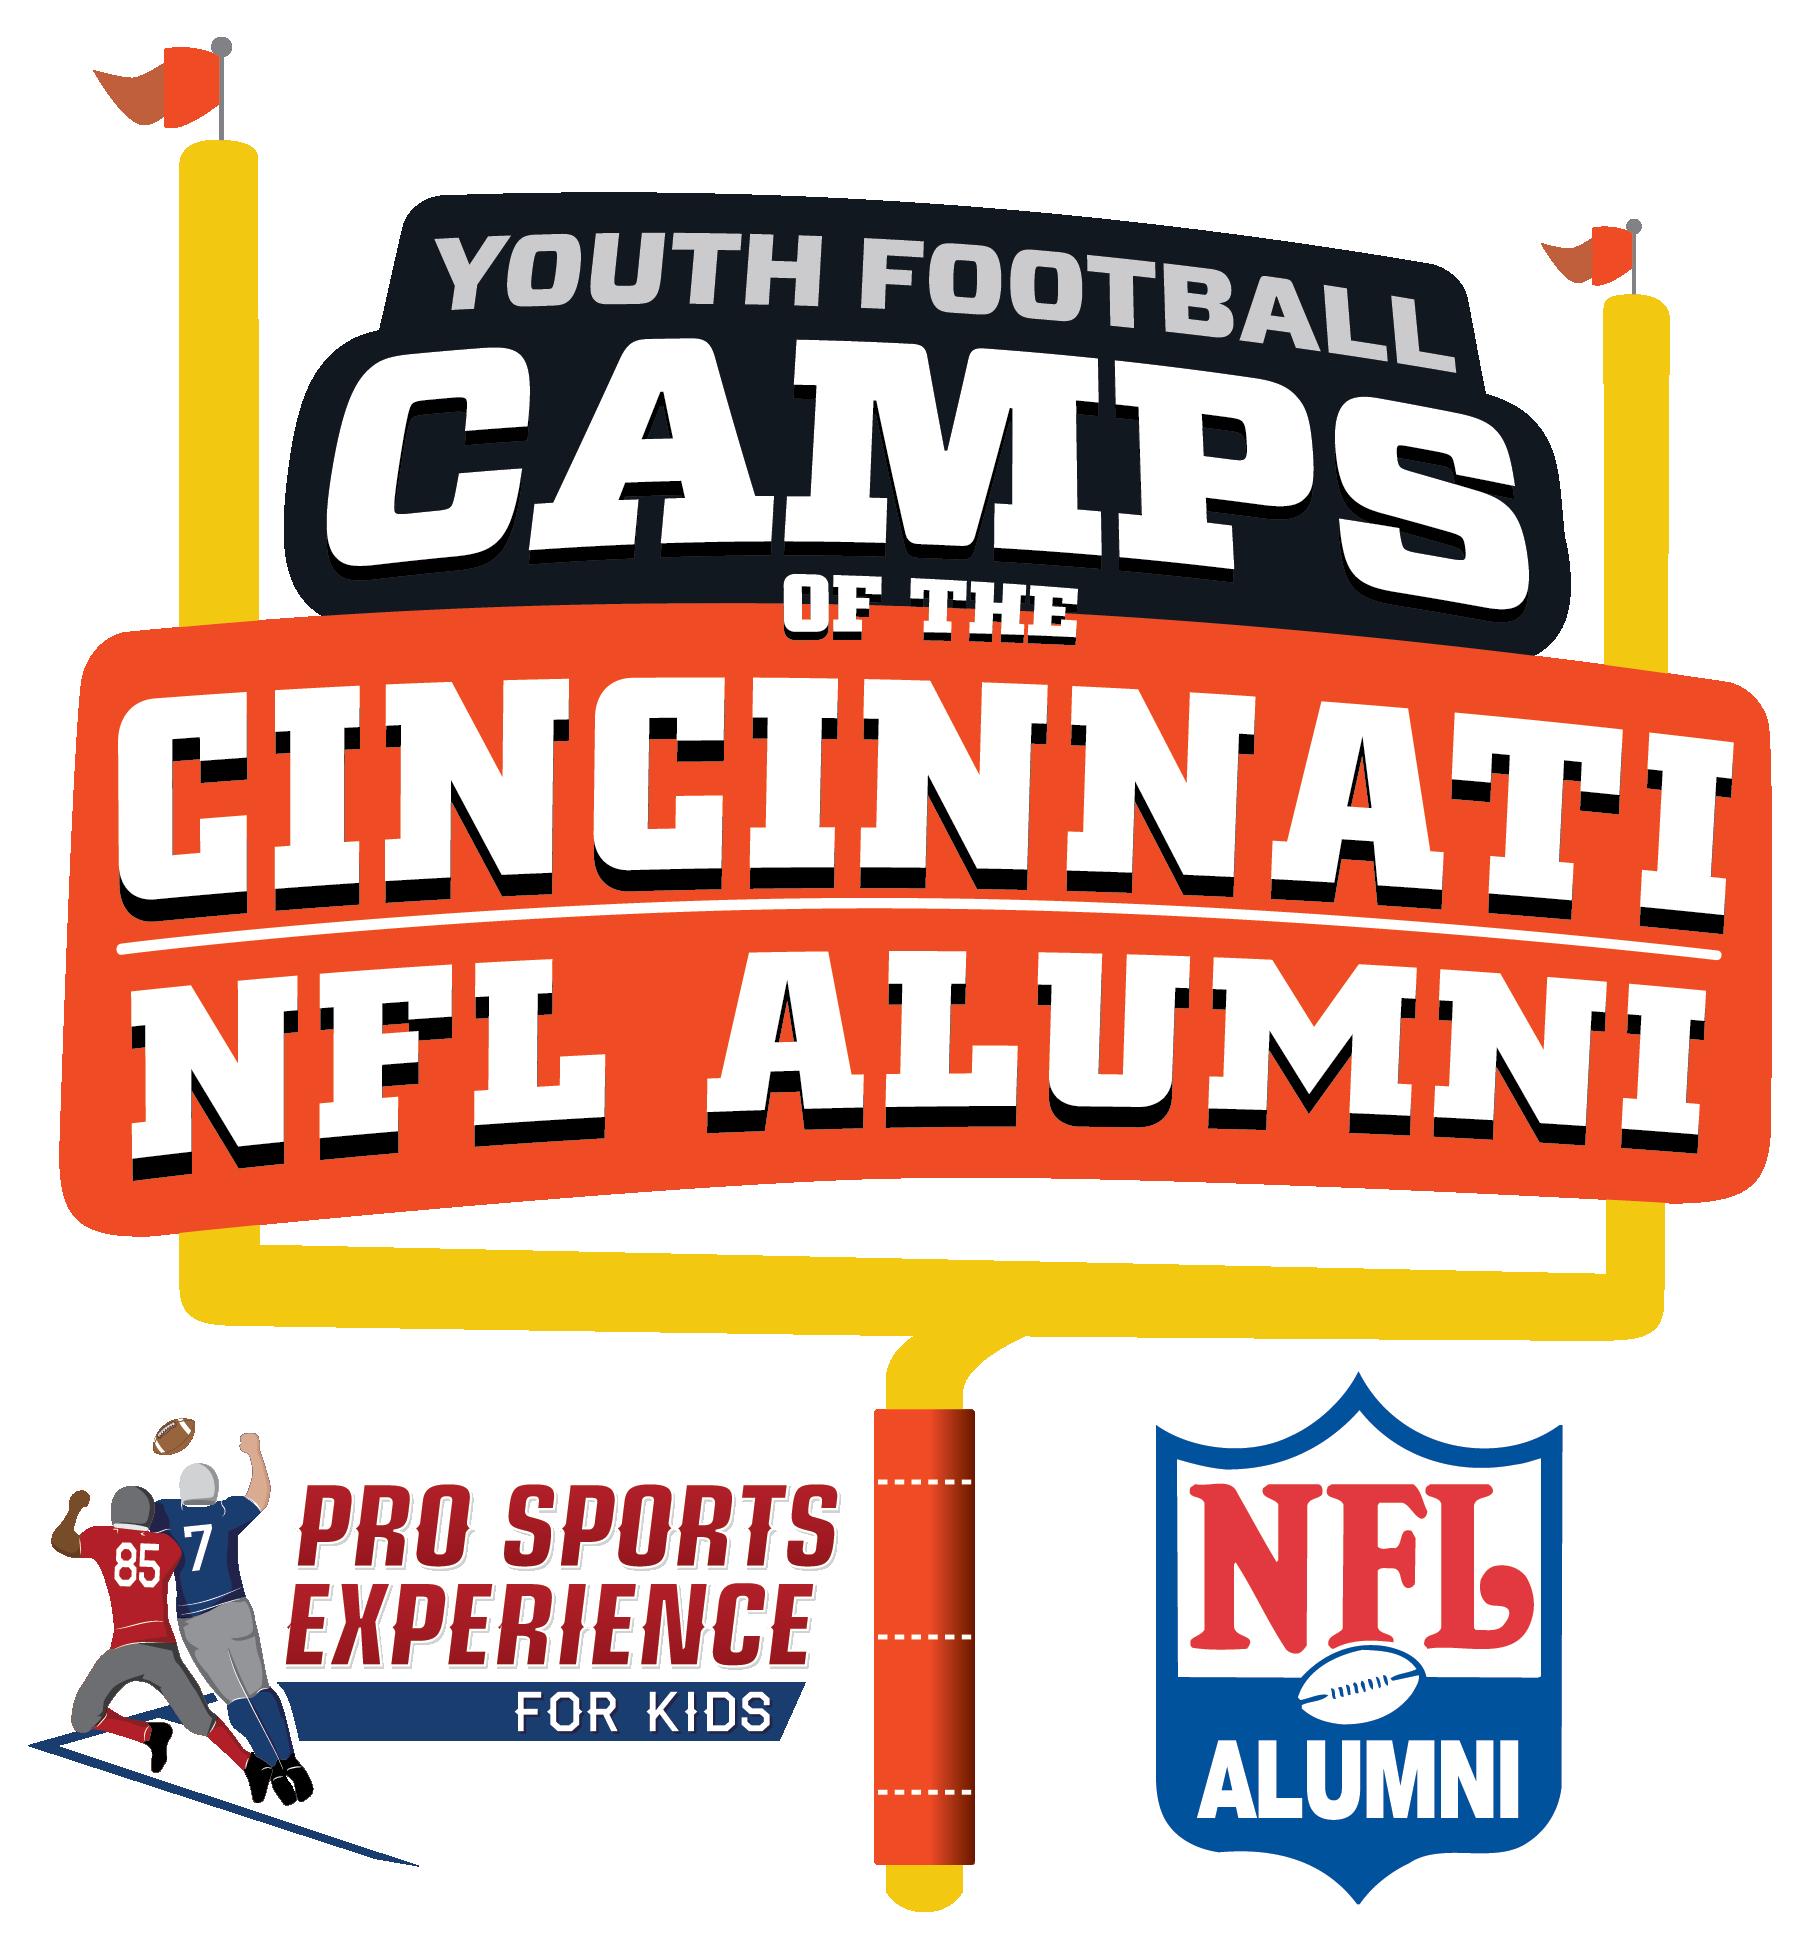 Cincinnati NFL Alumni Hero Youth Football Camps - Cincinnati